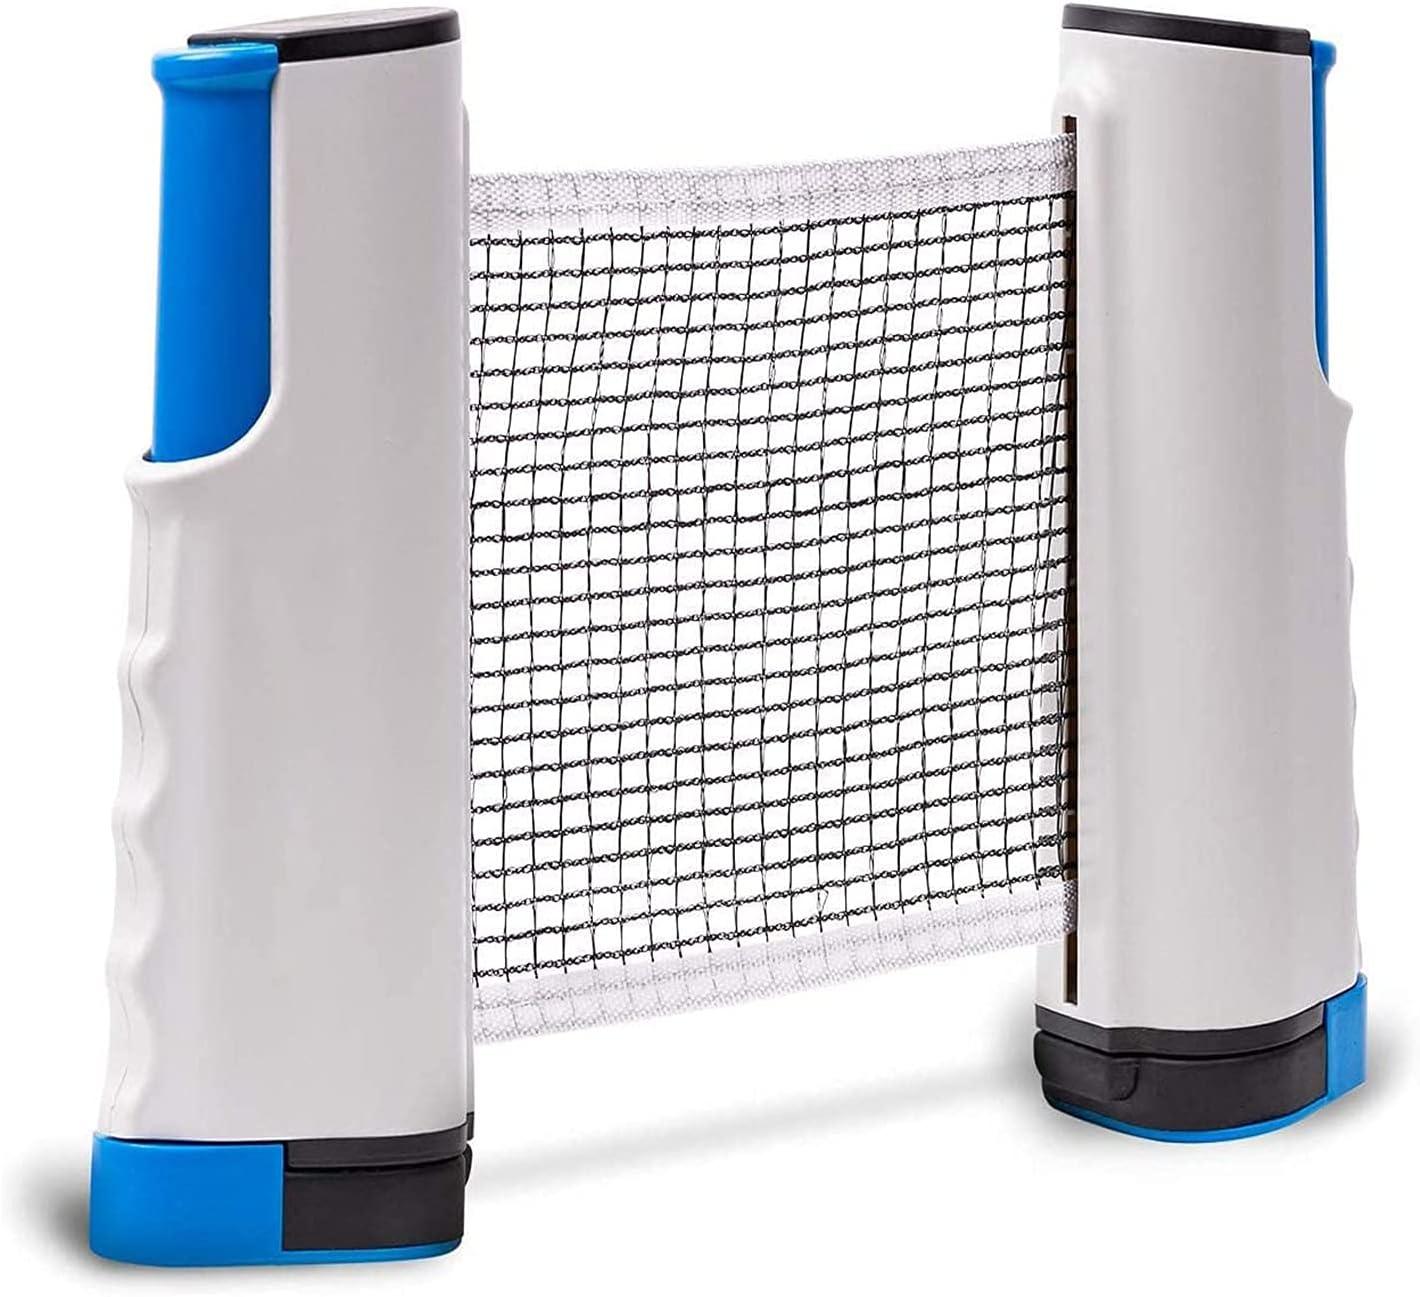 1 Pcs Tenis de Mesa Red, Red de Tenis de Mesa, Red de Ping Pong para Mesa, Red Ping Pong Mesa para Accesorios Deportivos de Interior al Aire Libre Ping Pang, Longitud Ajustable(Gris Azulado)